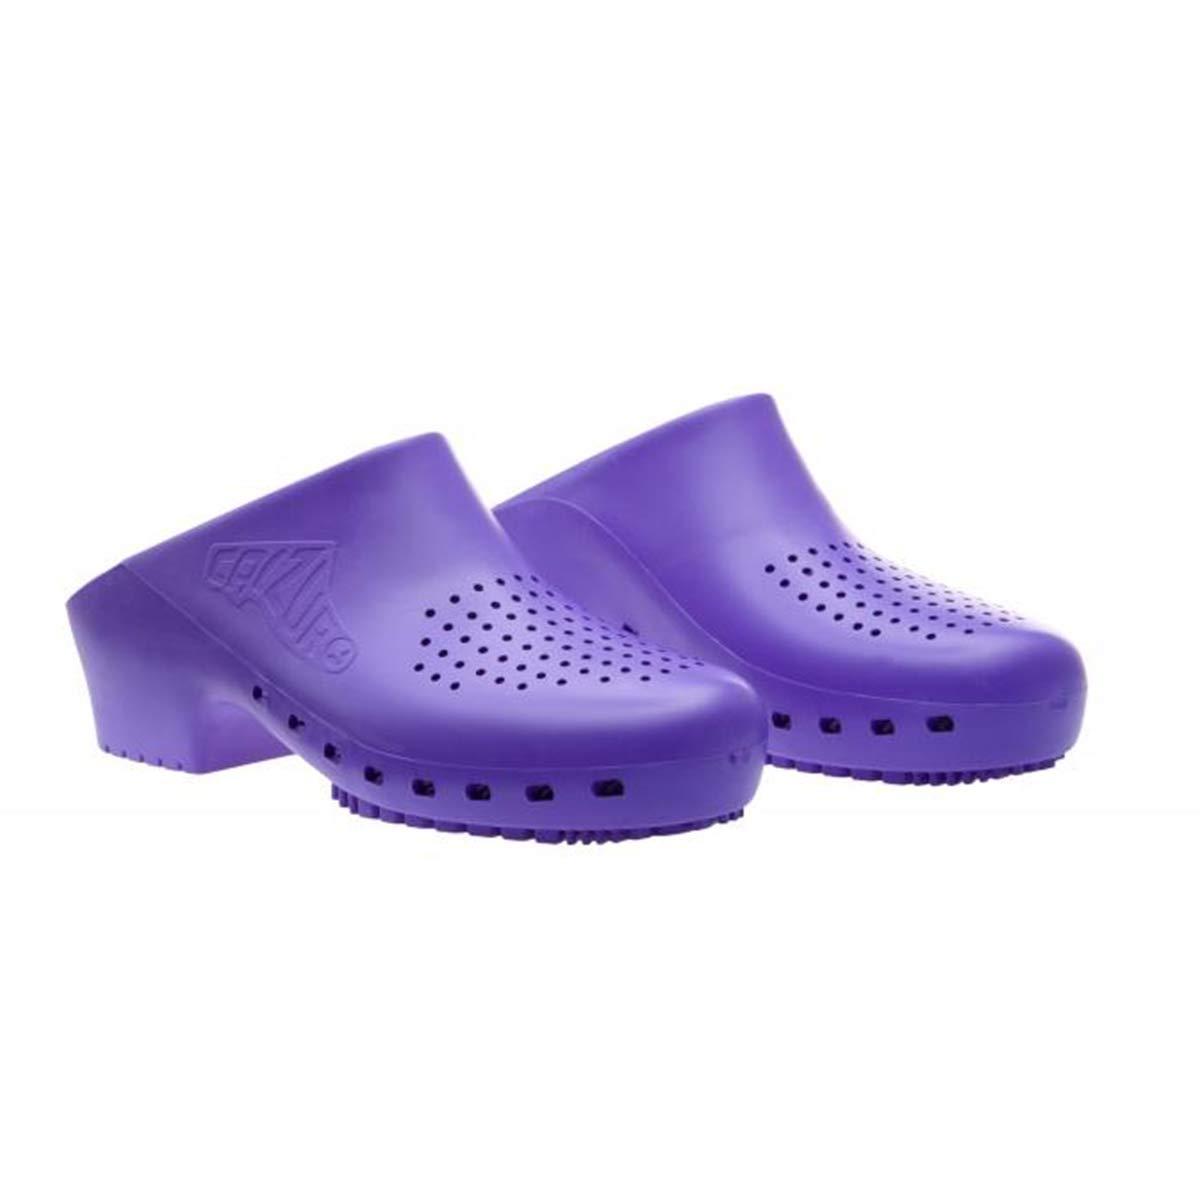 Cascos sanitarios calzuro S Classic con orificios profesionales CE 39-40 Arancio